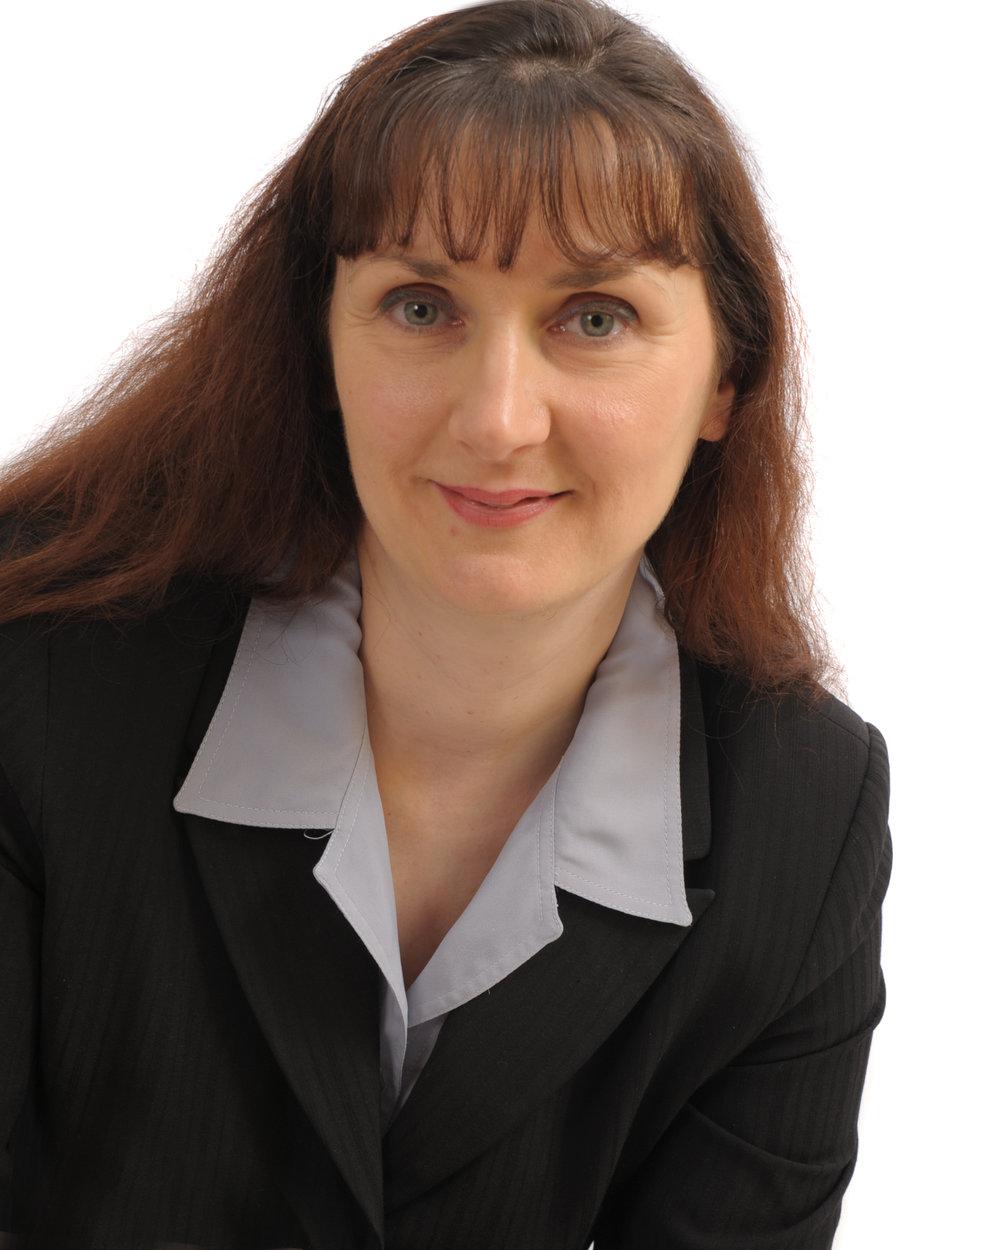 Dr. Vesna Grubacevic, Founder - QT